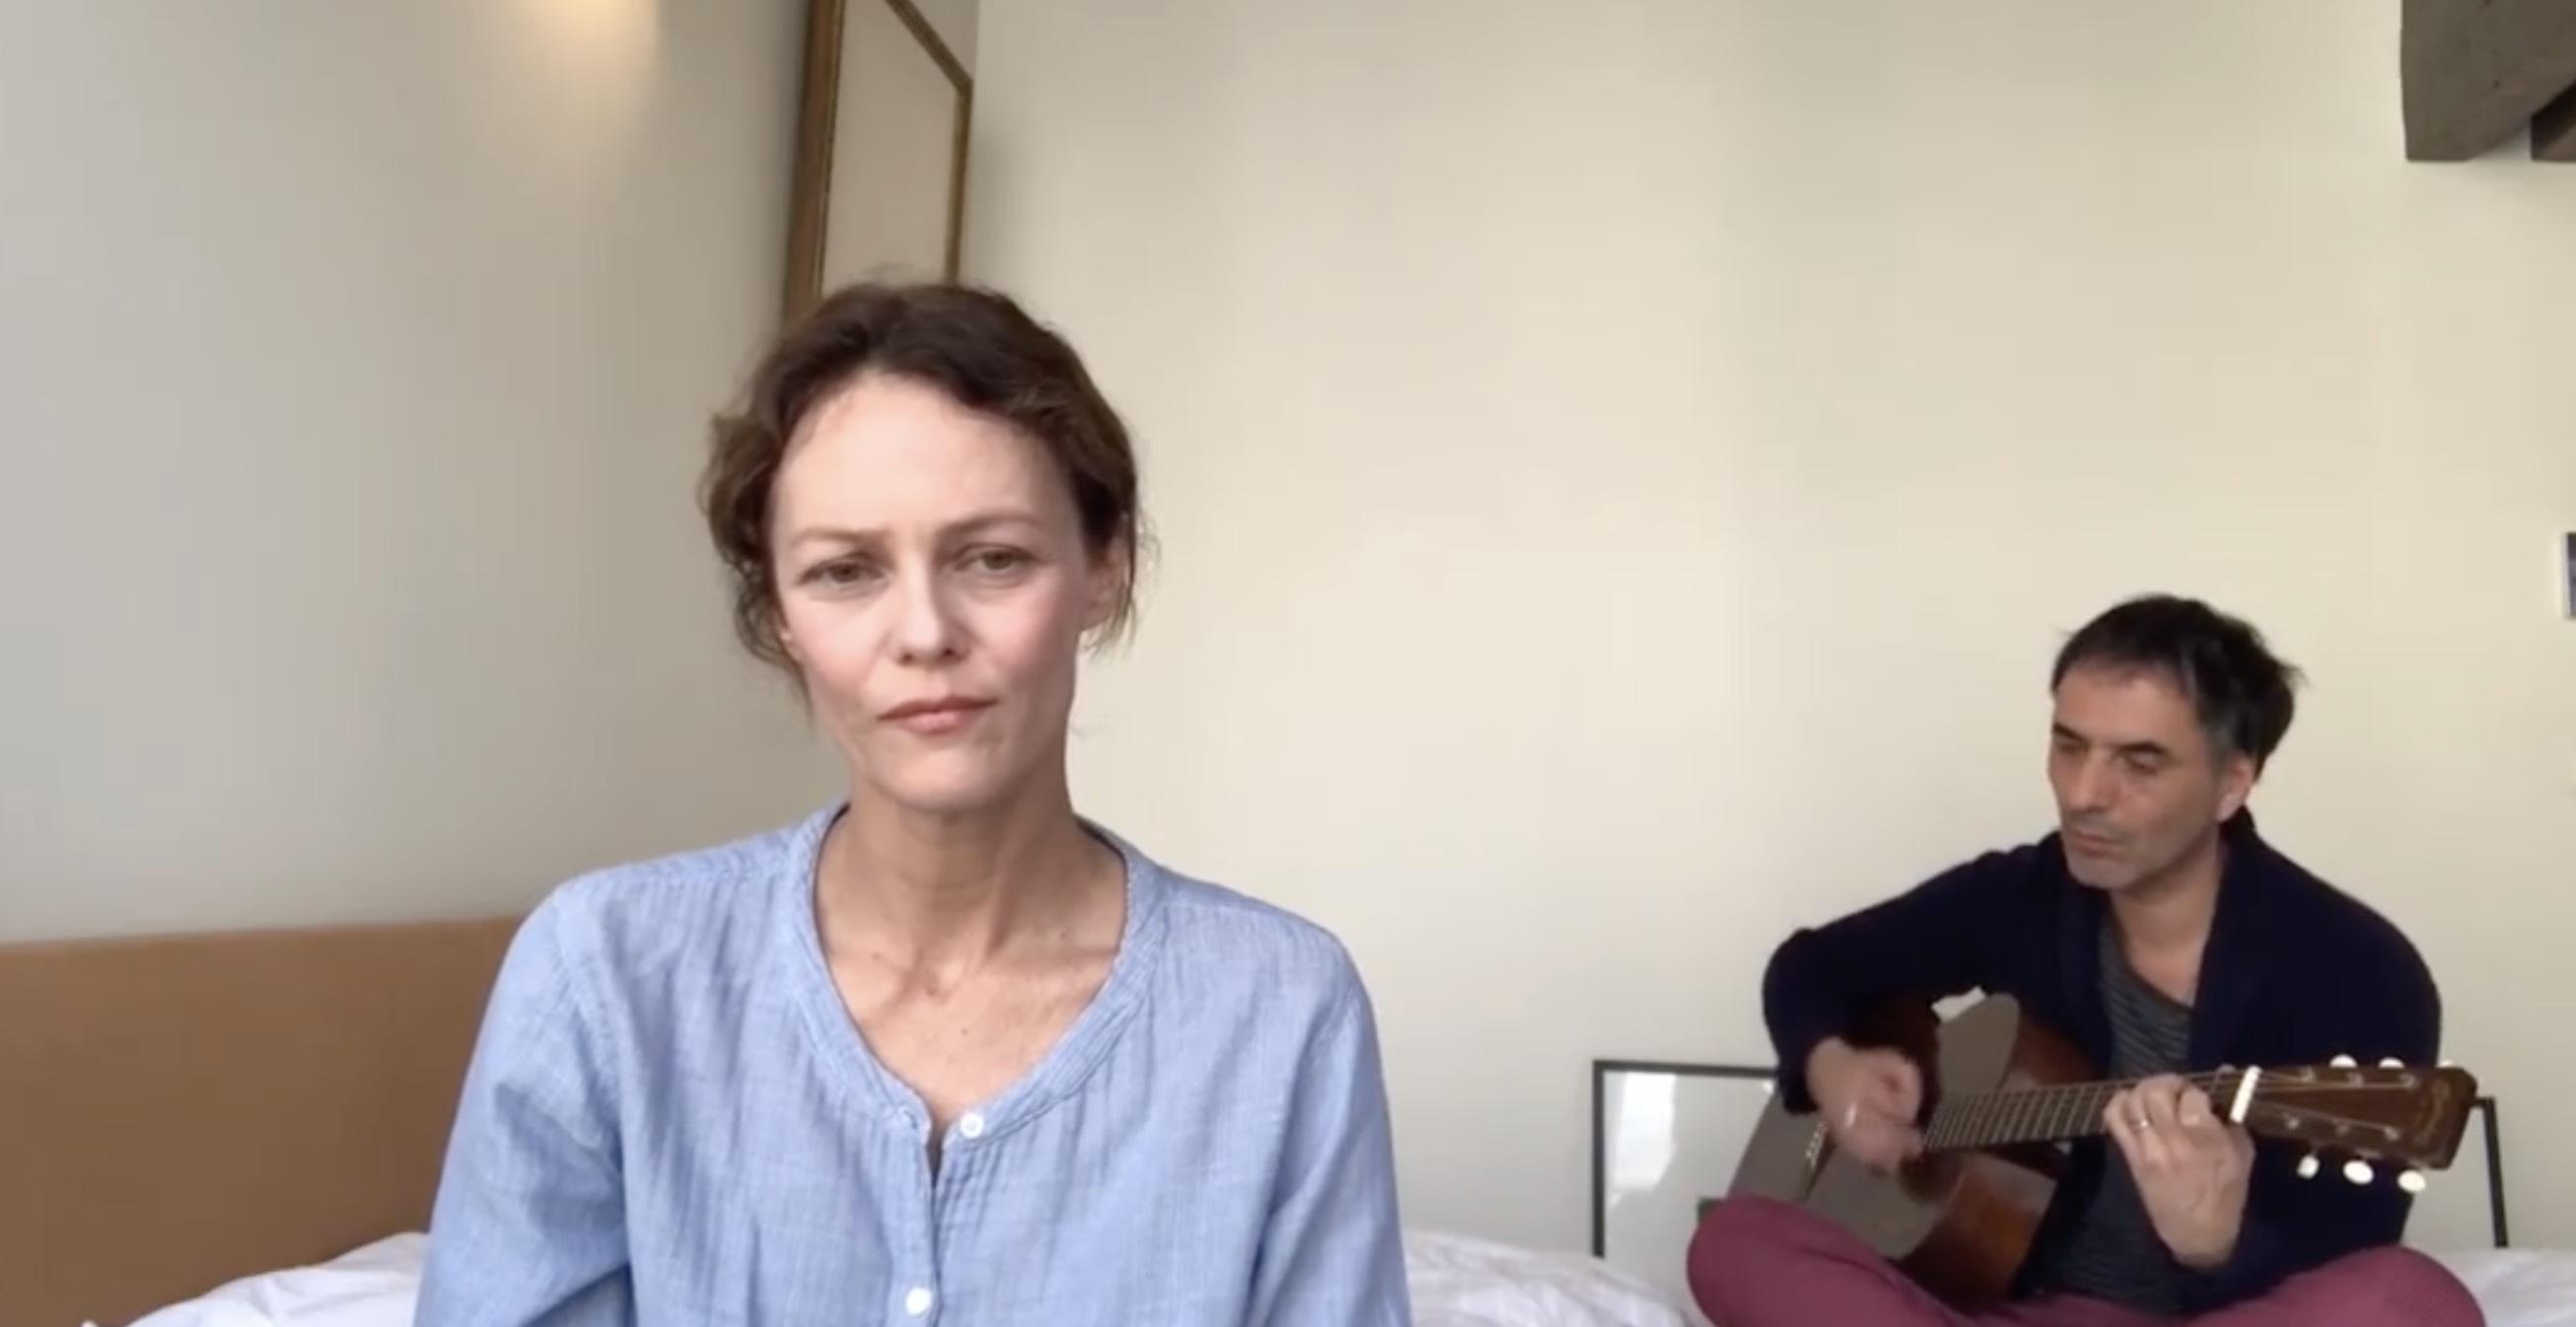 Hommage soignants - Vanessa Paradis